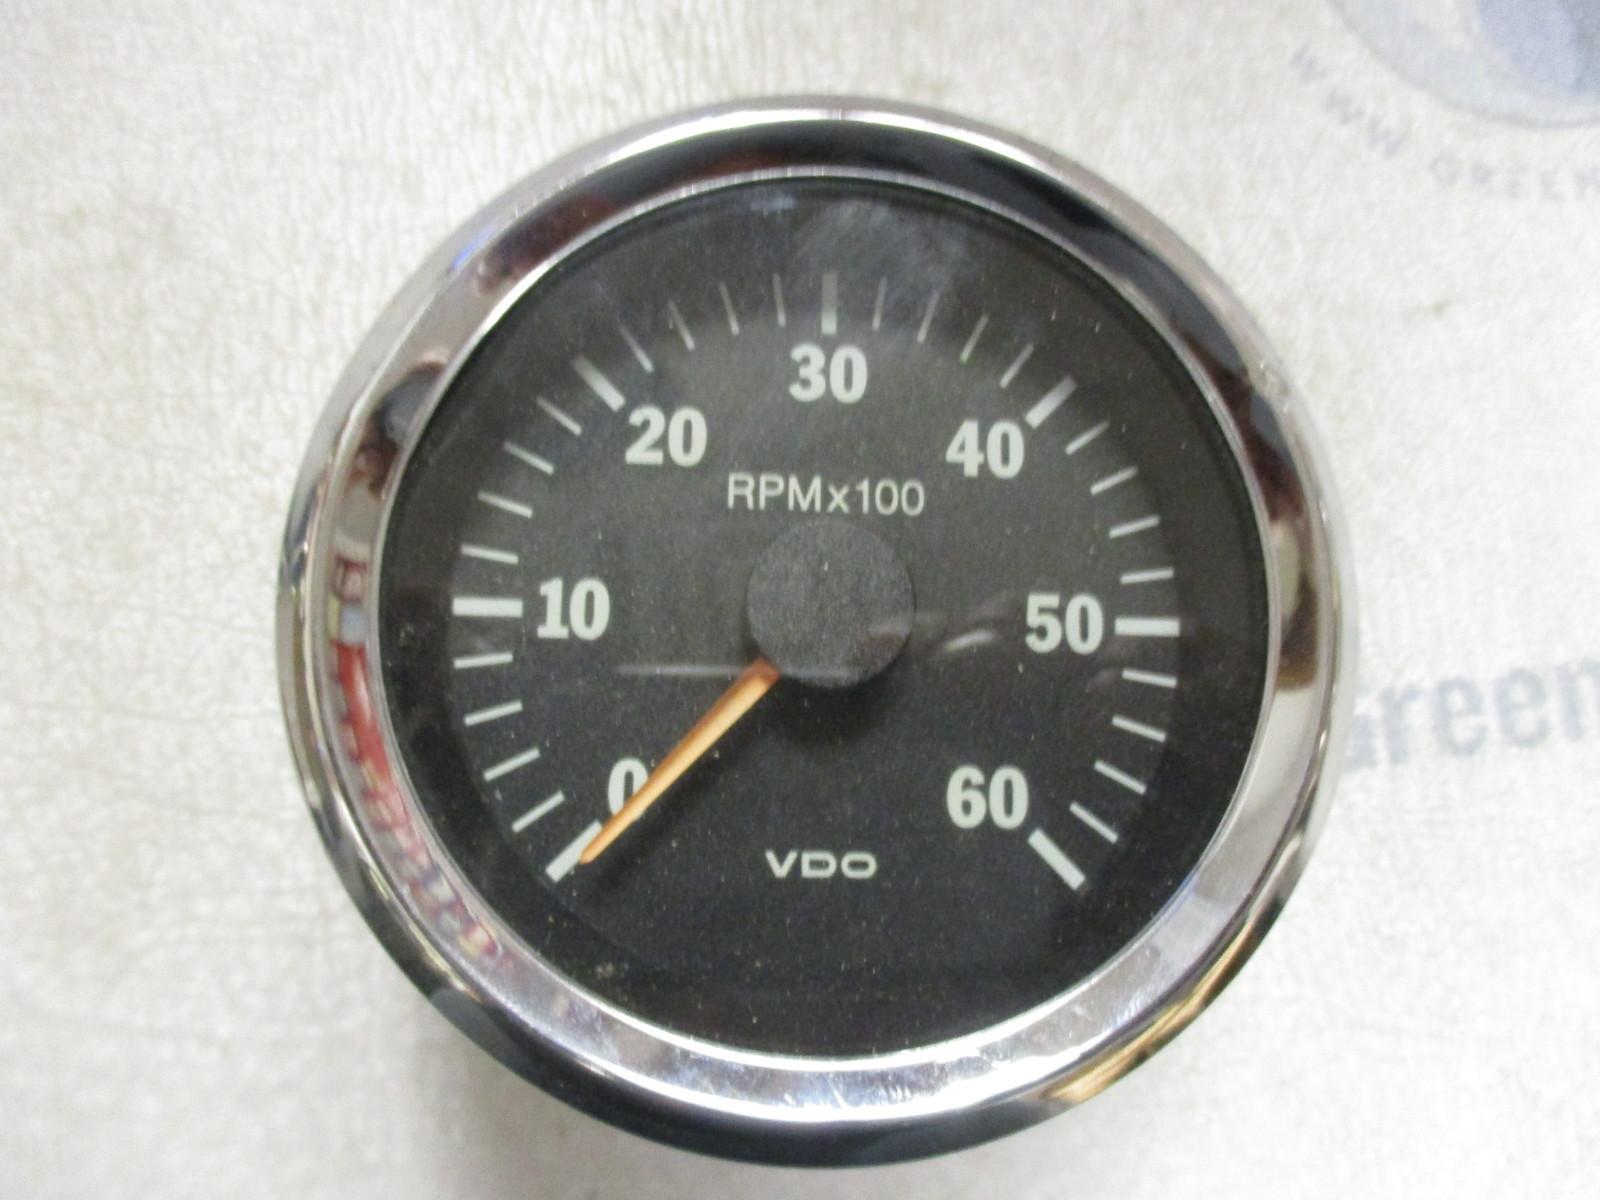 Vdo Tachometer Repair Gas Gauge Wiring Diagram 240 33 Ohm